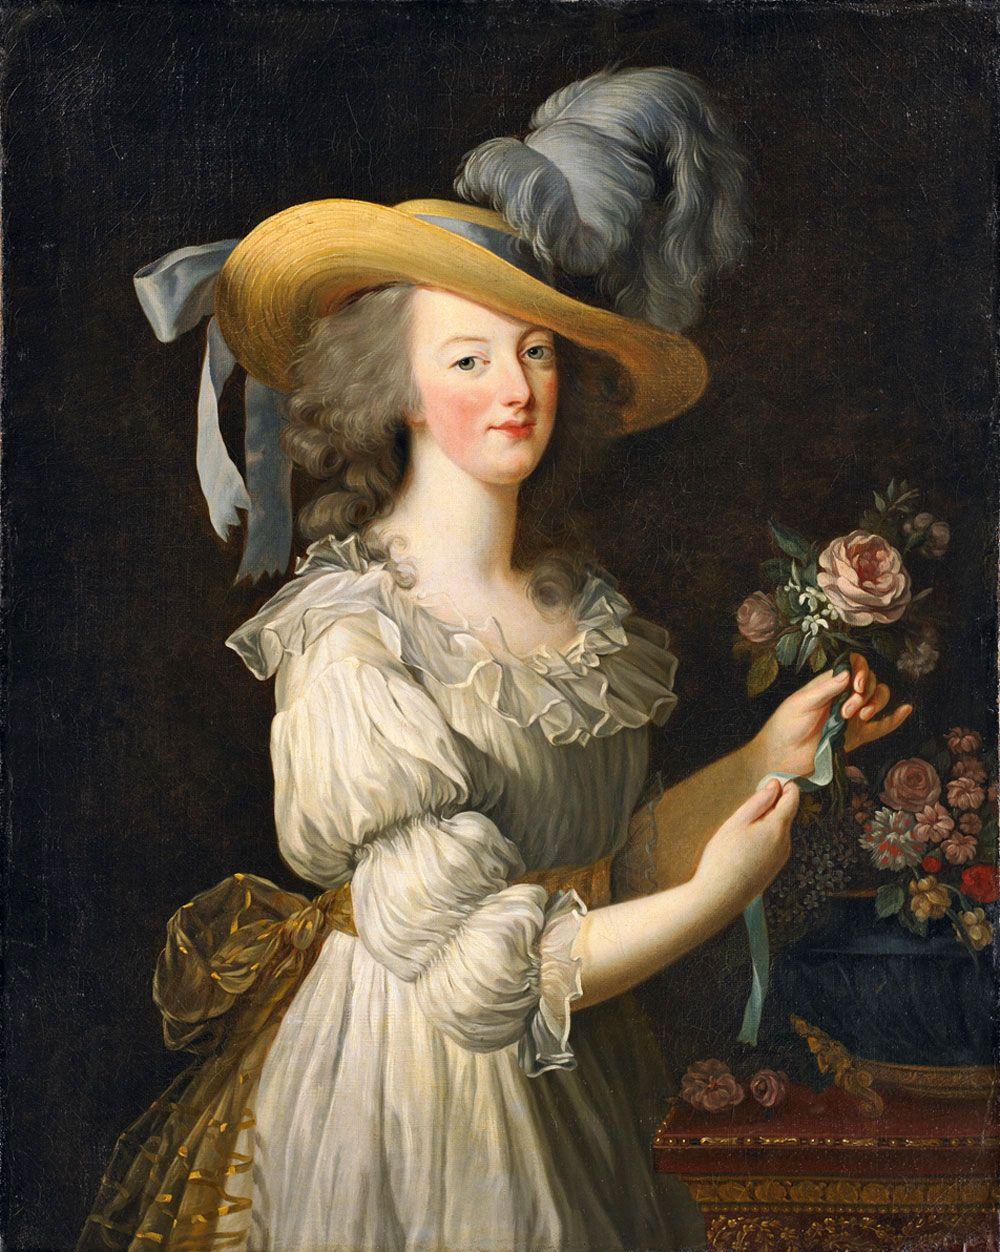 Marie-Antoinette's diamond bracelets are up for auction